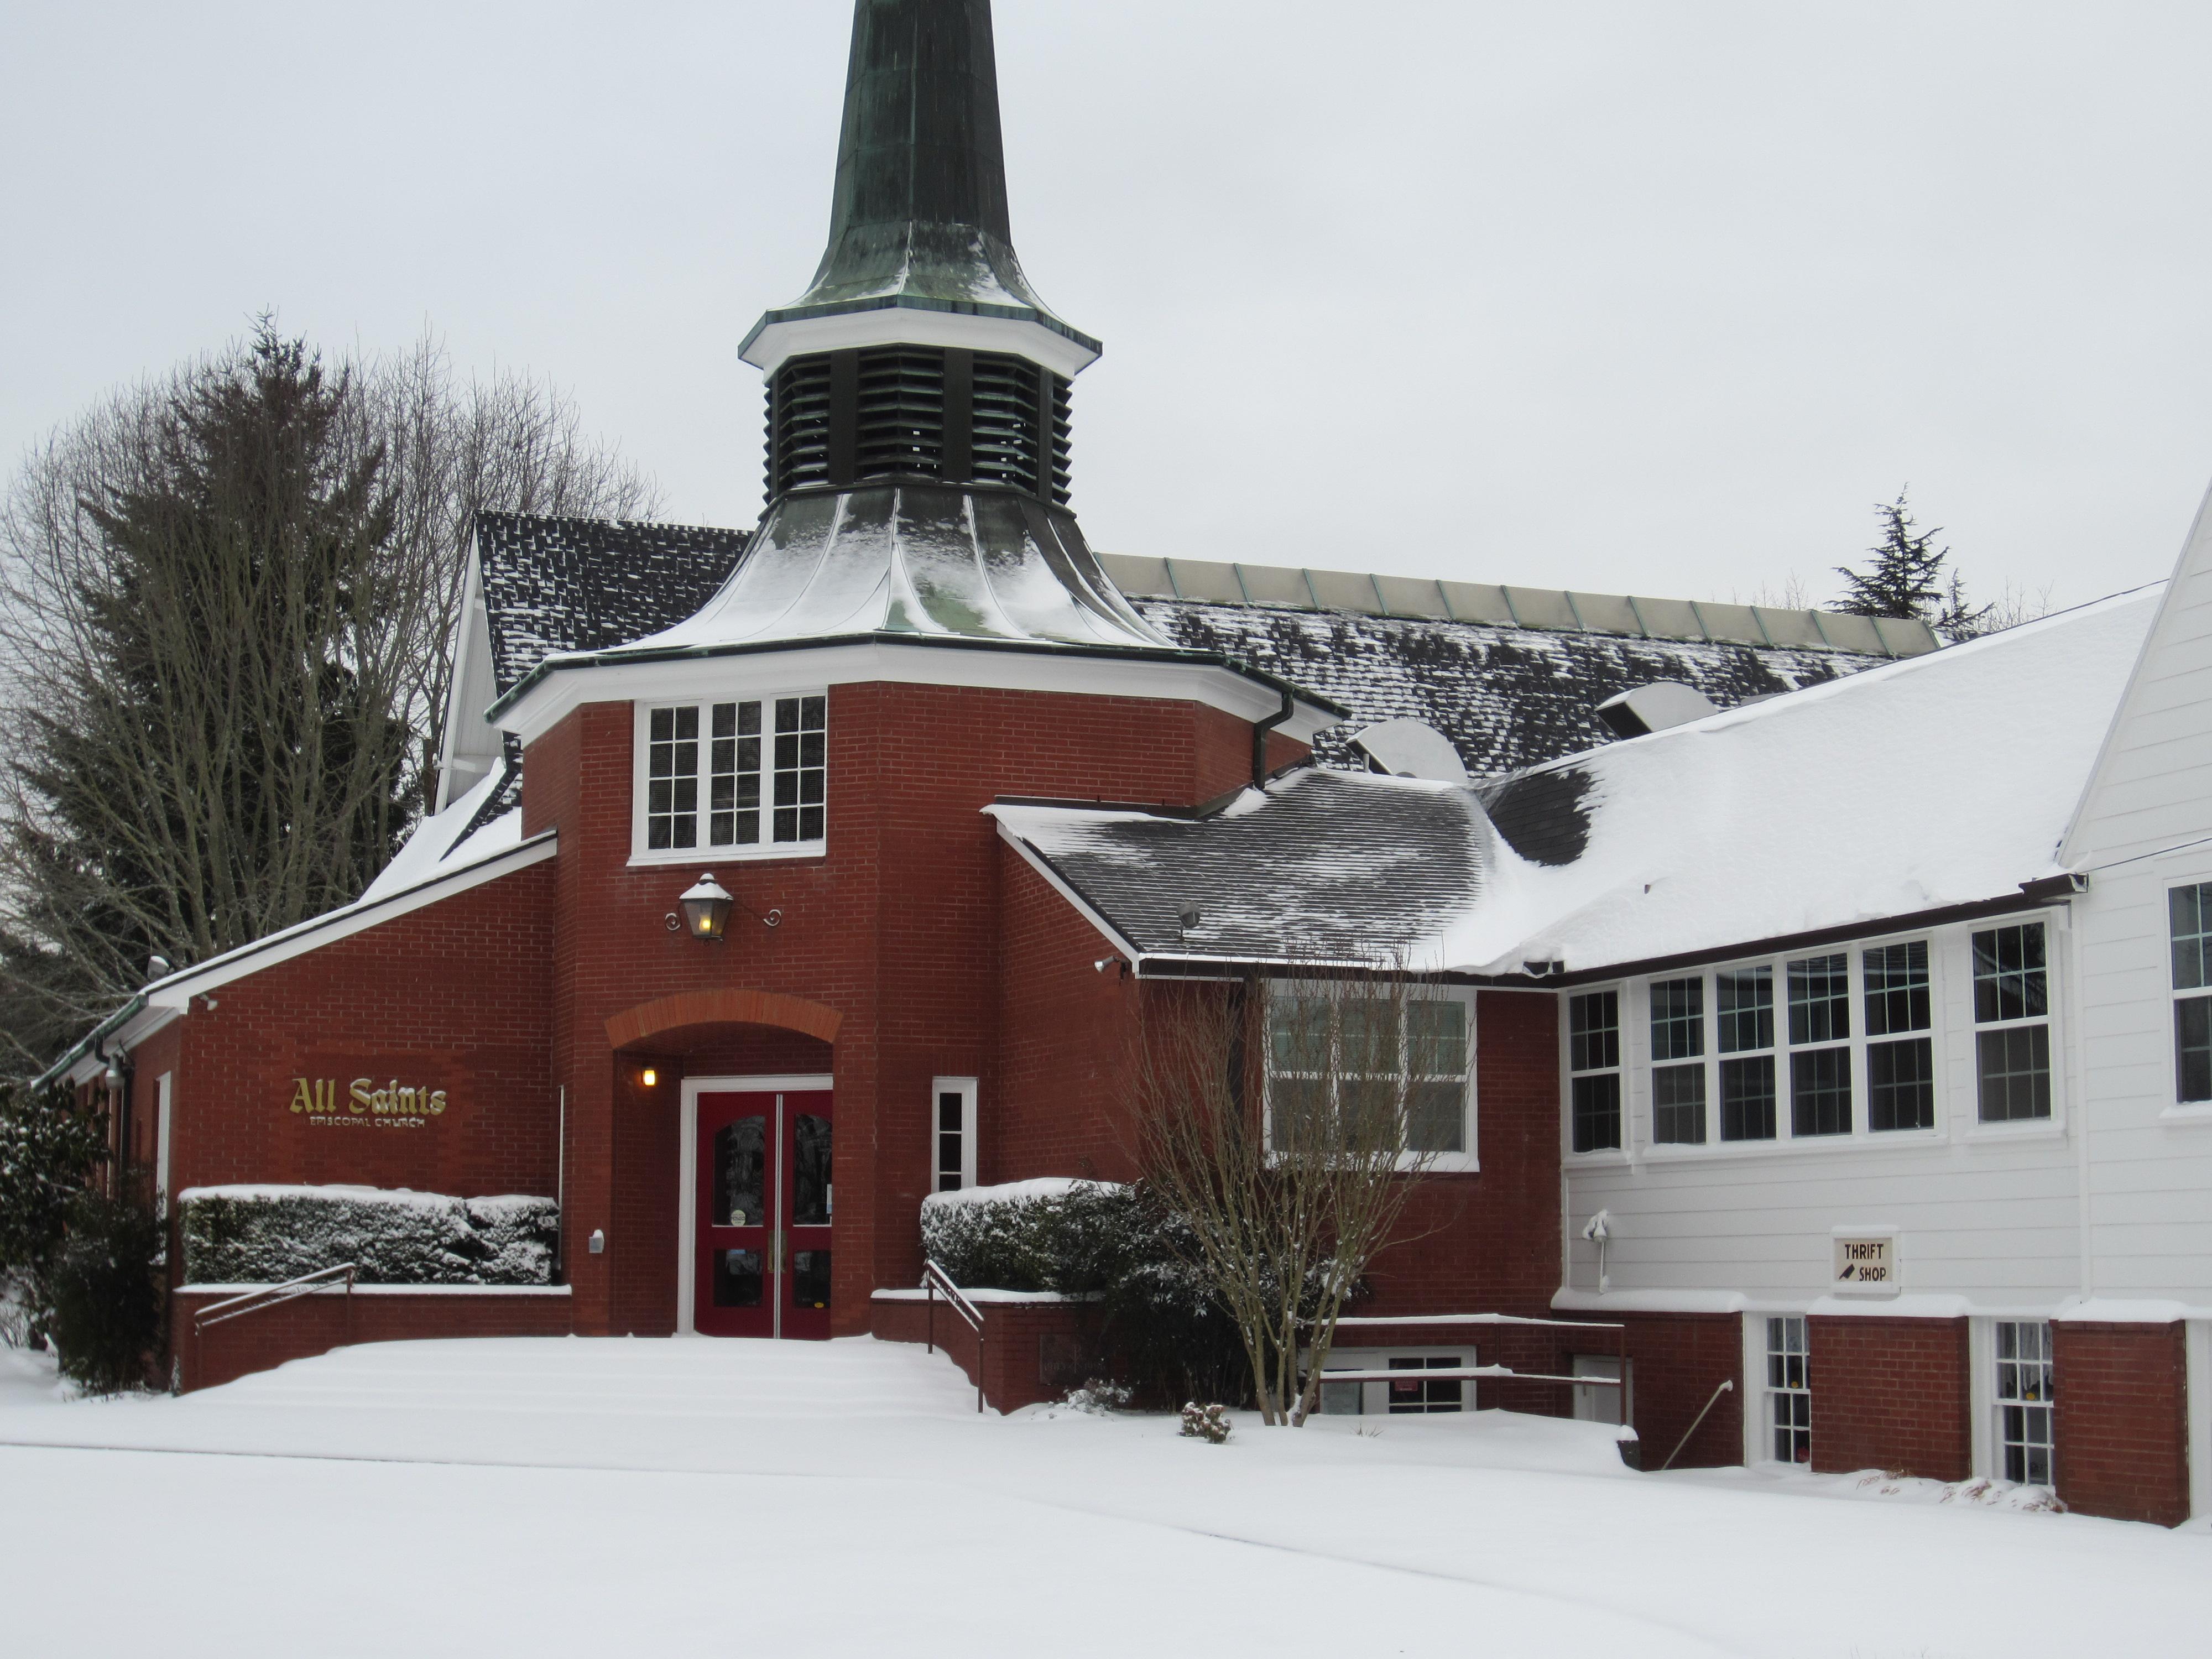 Lovely All Saints Church Portland #1: All_Saints_Episcopal_Church%2C_Woodstock%2C_Portland%2C_Oregon_%282014%29_-_2.JPG